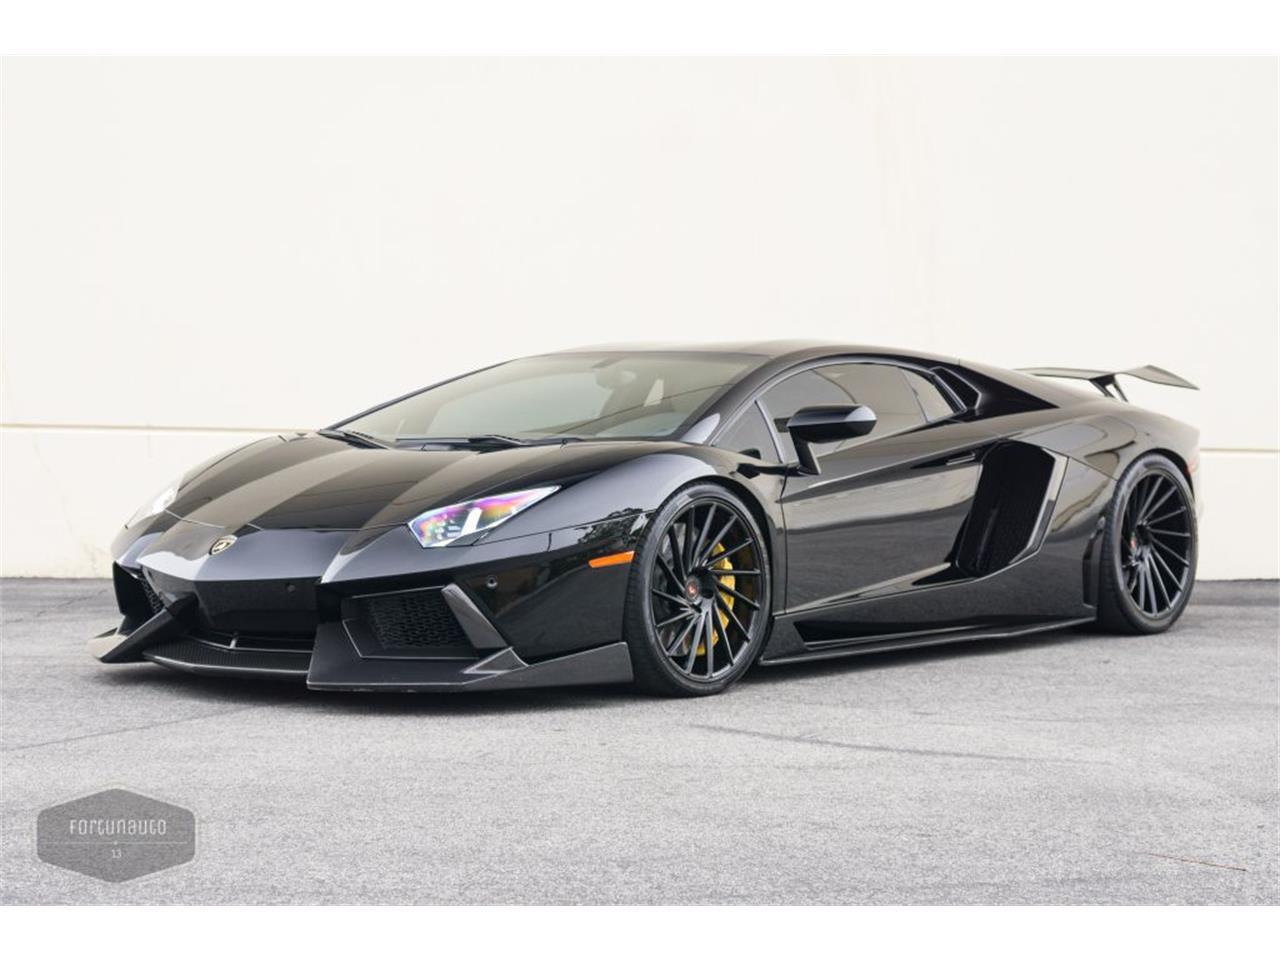 2012 Lamborghini Aventador For Sale Classiccarscom Cc